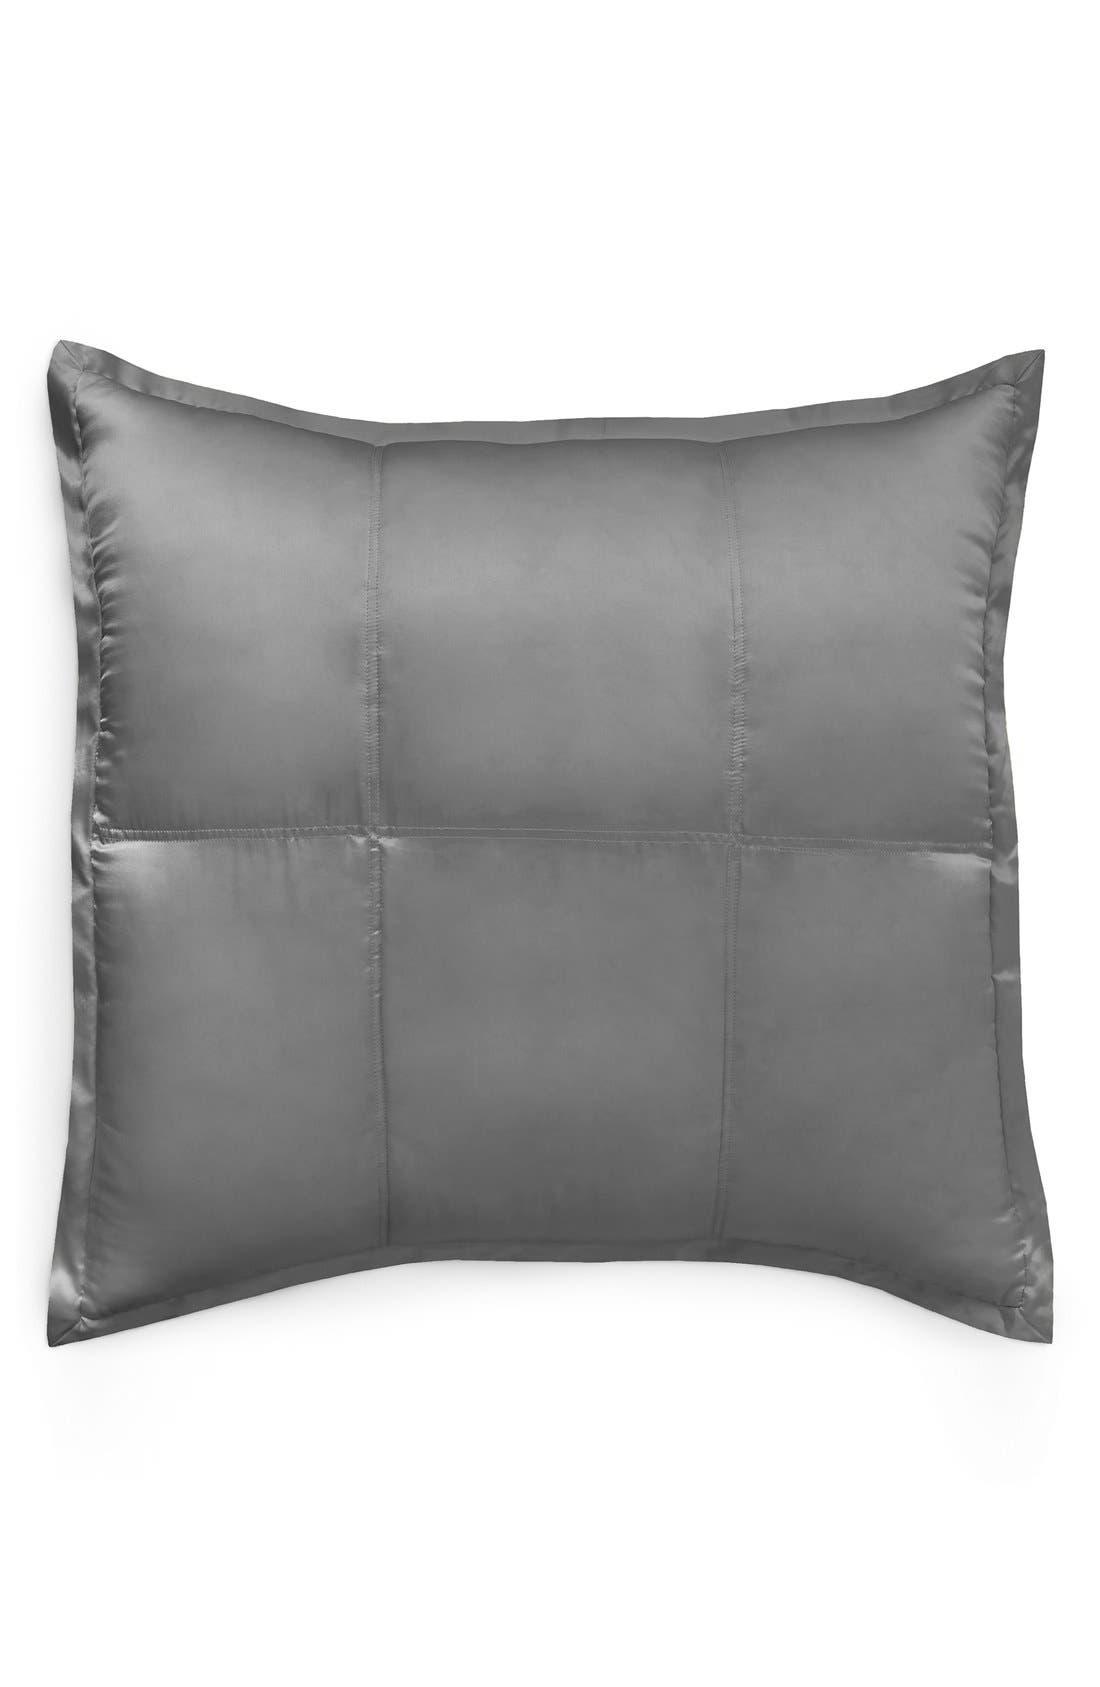 Donna Karan Collection 'Surface' Silk Charmeuse Euro Pillow Sham,                         Main,                         color, CHARCOAL